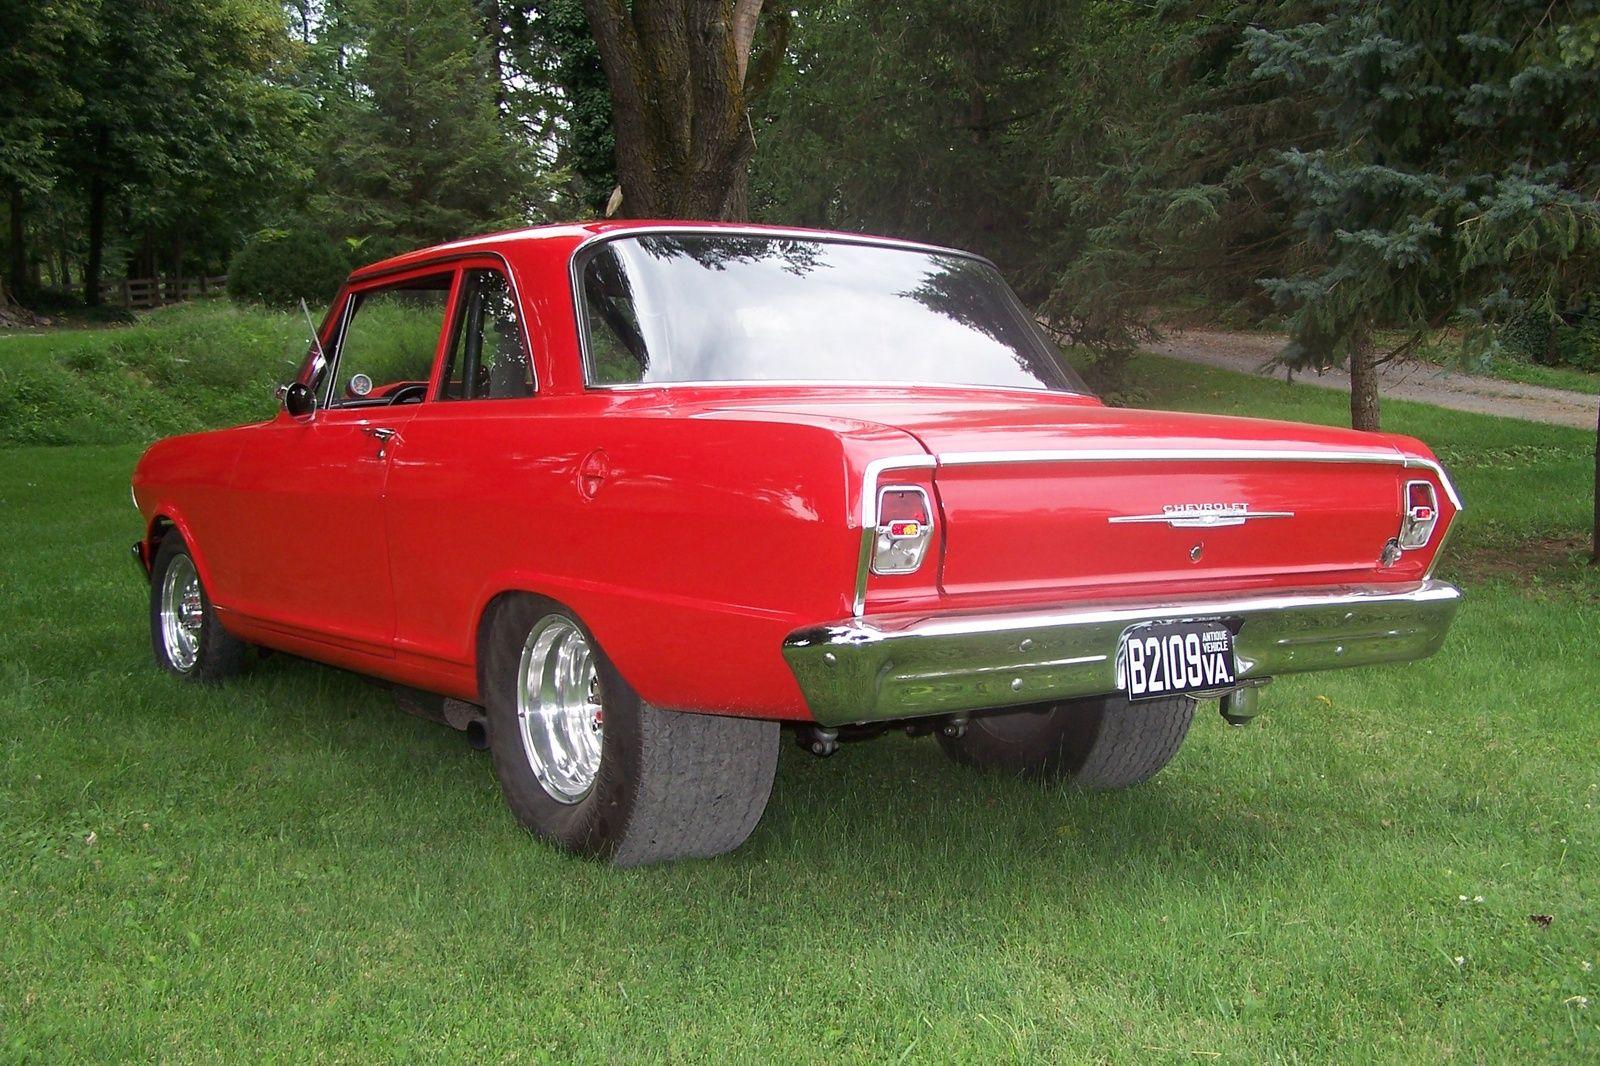 1963 Chevrolet Nova Maintenance/restoration of old/vintage ...